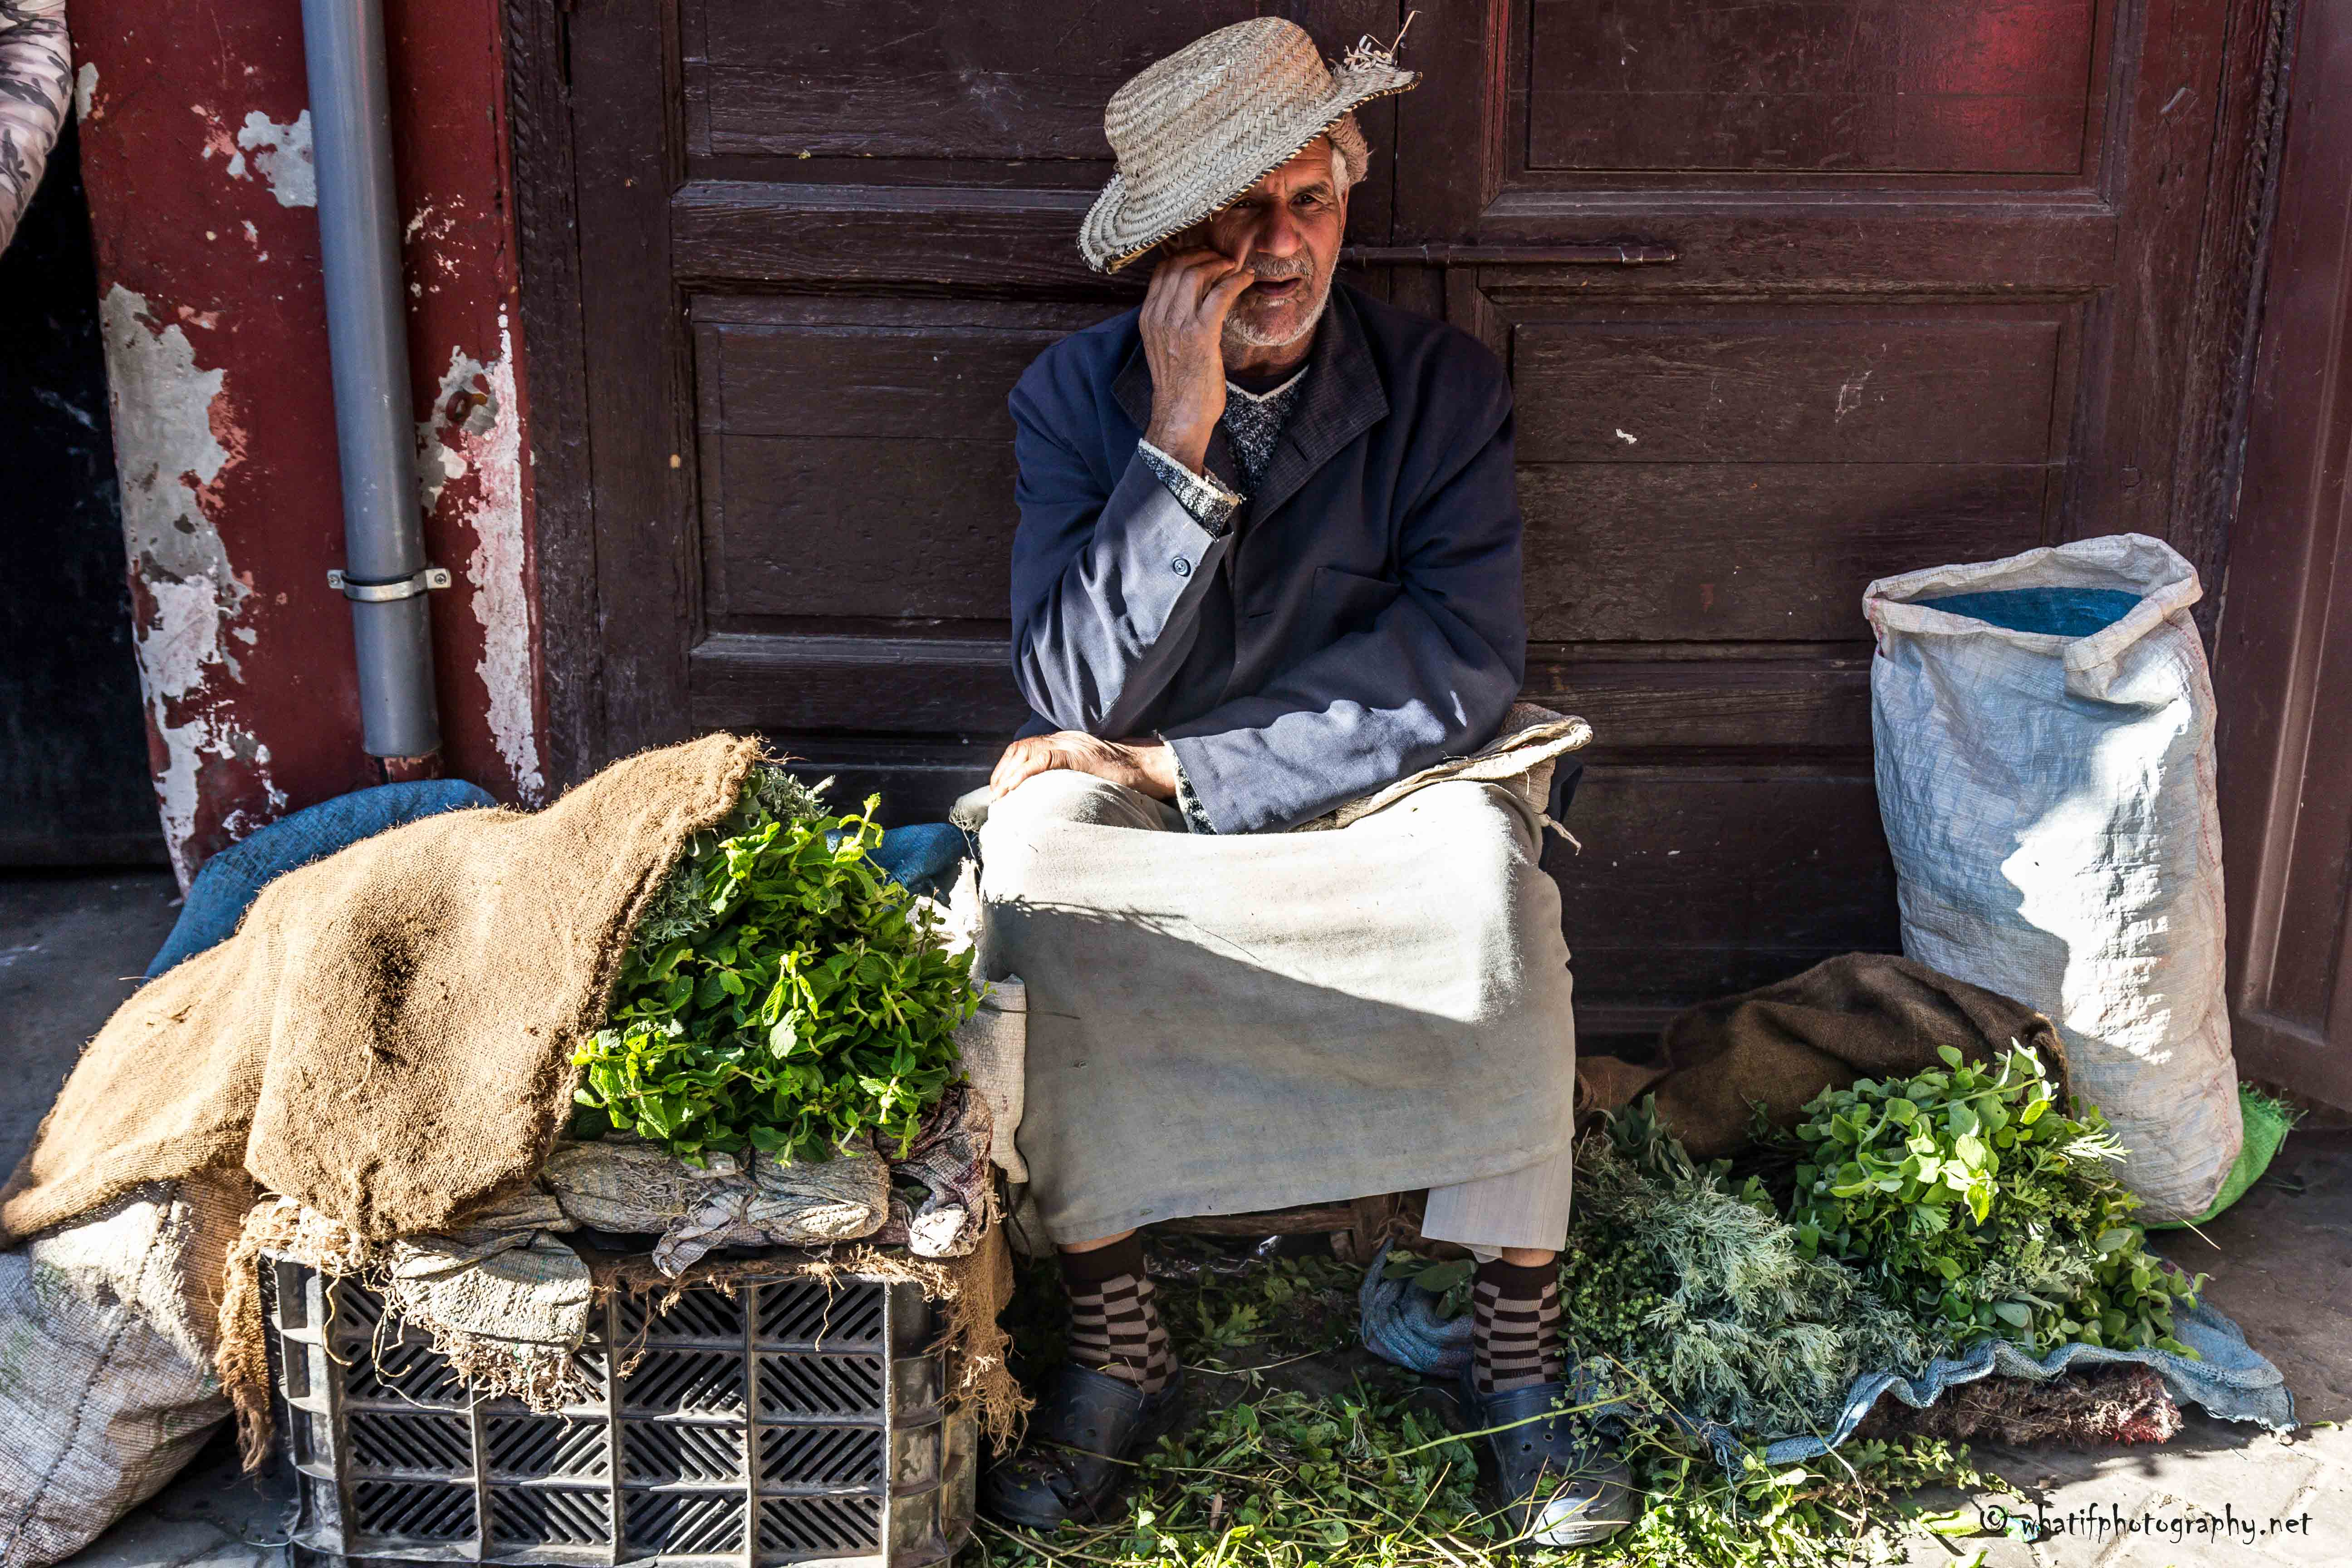 Moroccan Mint Seller